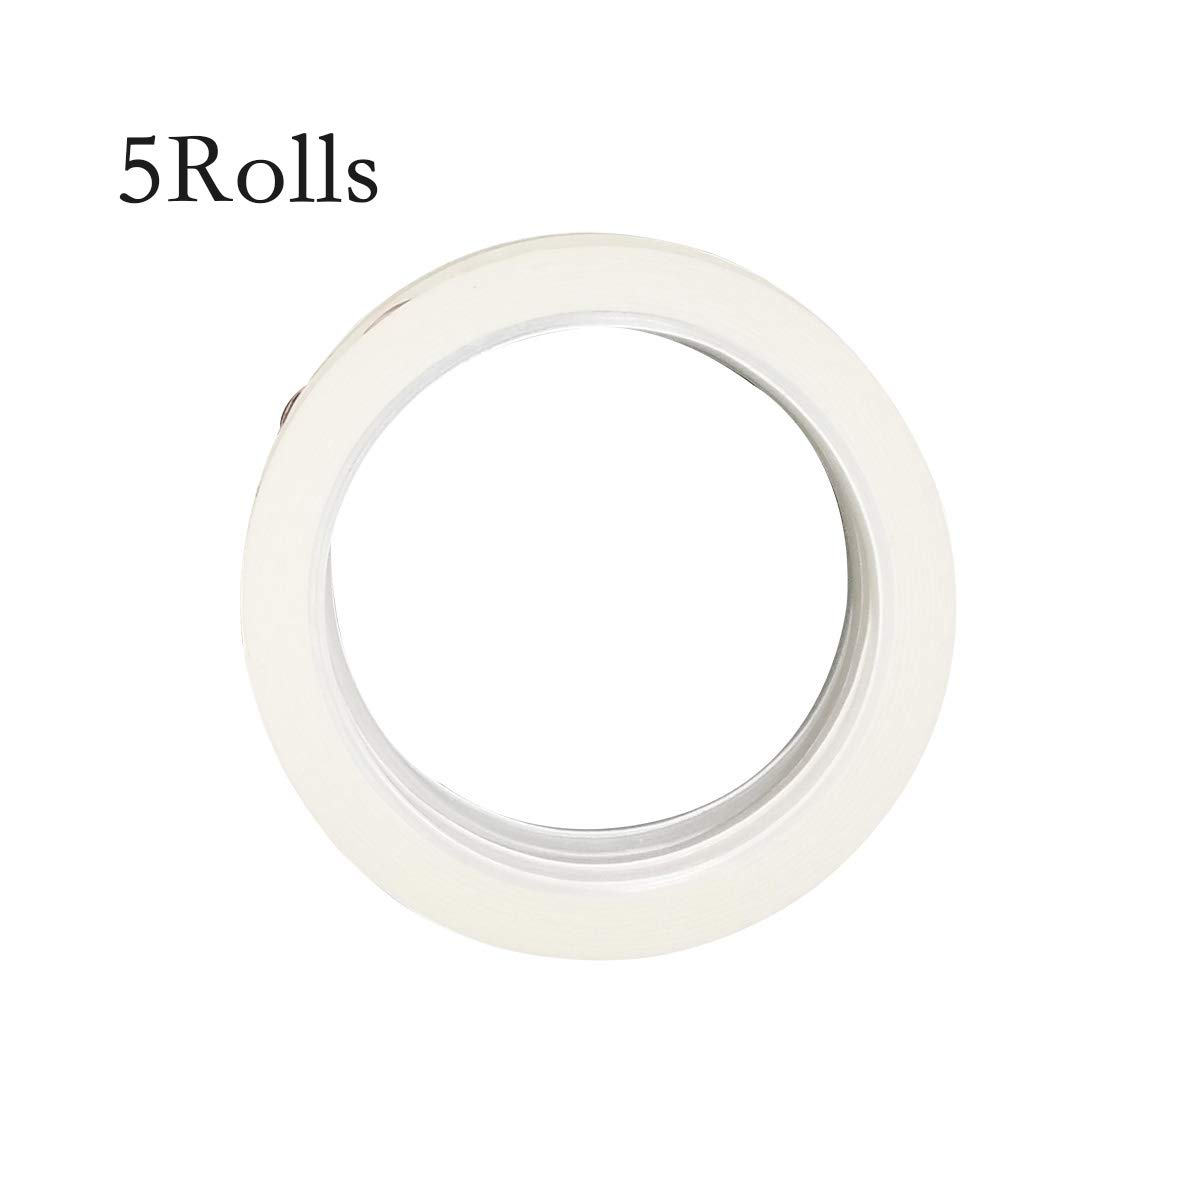 LGEGE 5 rolls white Graphic Chart Tape / Artist Tape (Width: 3mm)